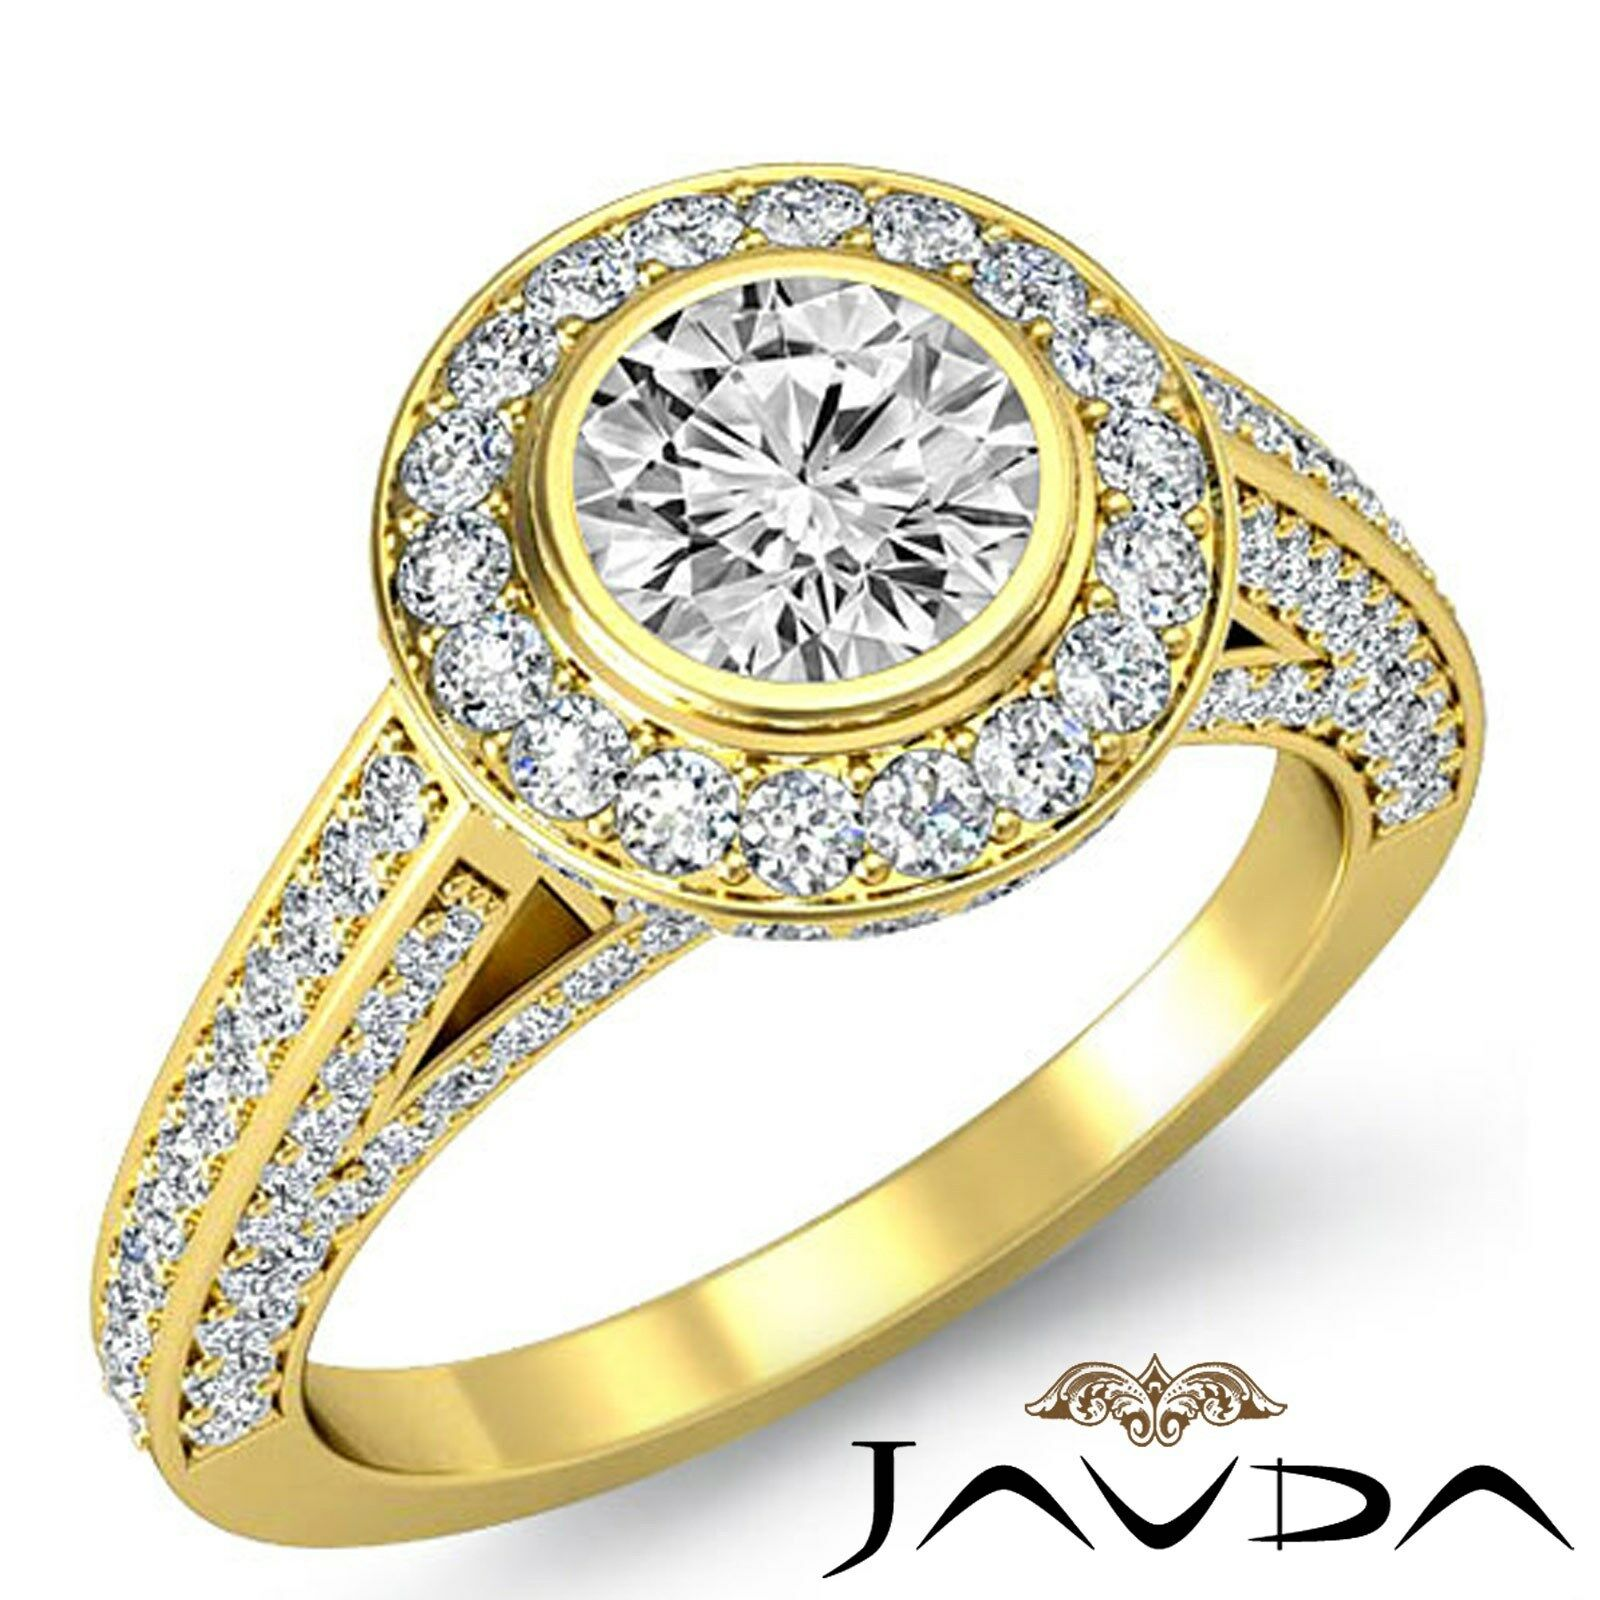 Bridge Accent Circa Halo Round Diamond Engagement Bezel Ring GIA I VS2 2.75 Ct